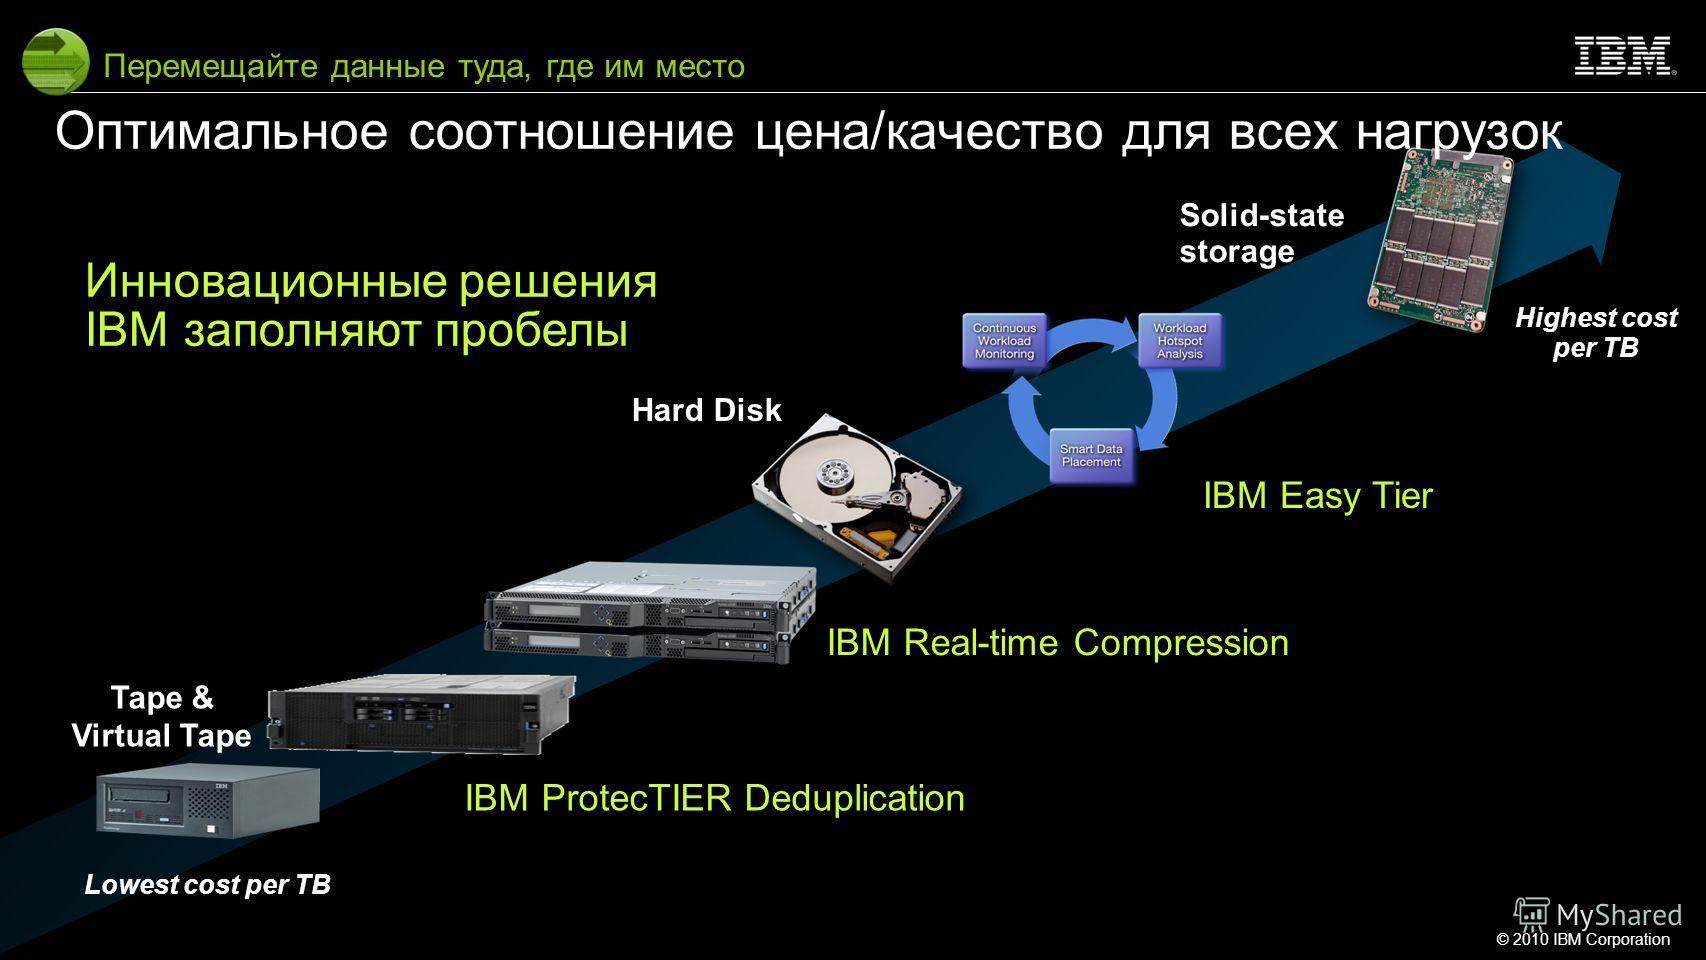 © 2010 IBM Corporation11 Lowest cost per TB Hard Disk Solid-state storage Tape & Virtual Tape IBM Real-time Compression IBM Easy Tier Оптимальное соотношение цена/качество для всех нагрузок Перемещайте данные туда, где им место IBM ProtecTIER Dedupli